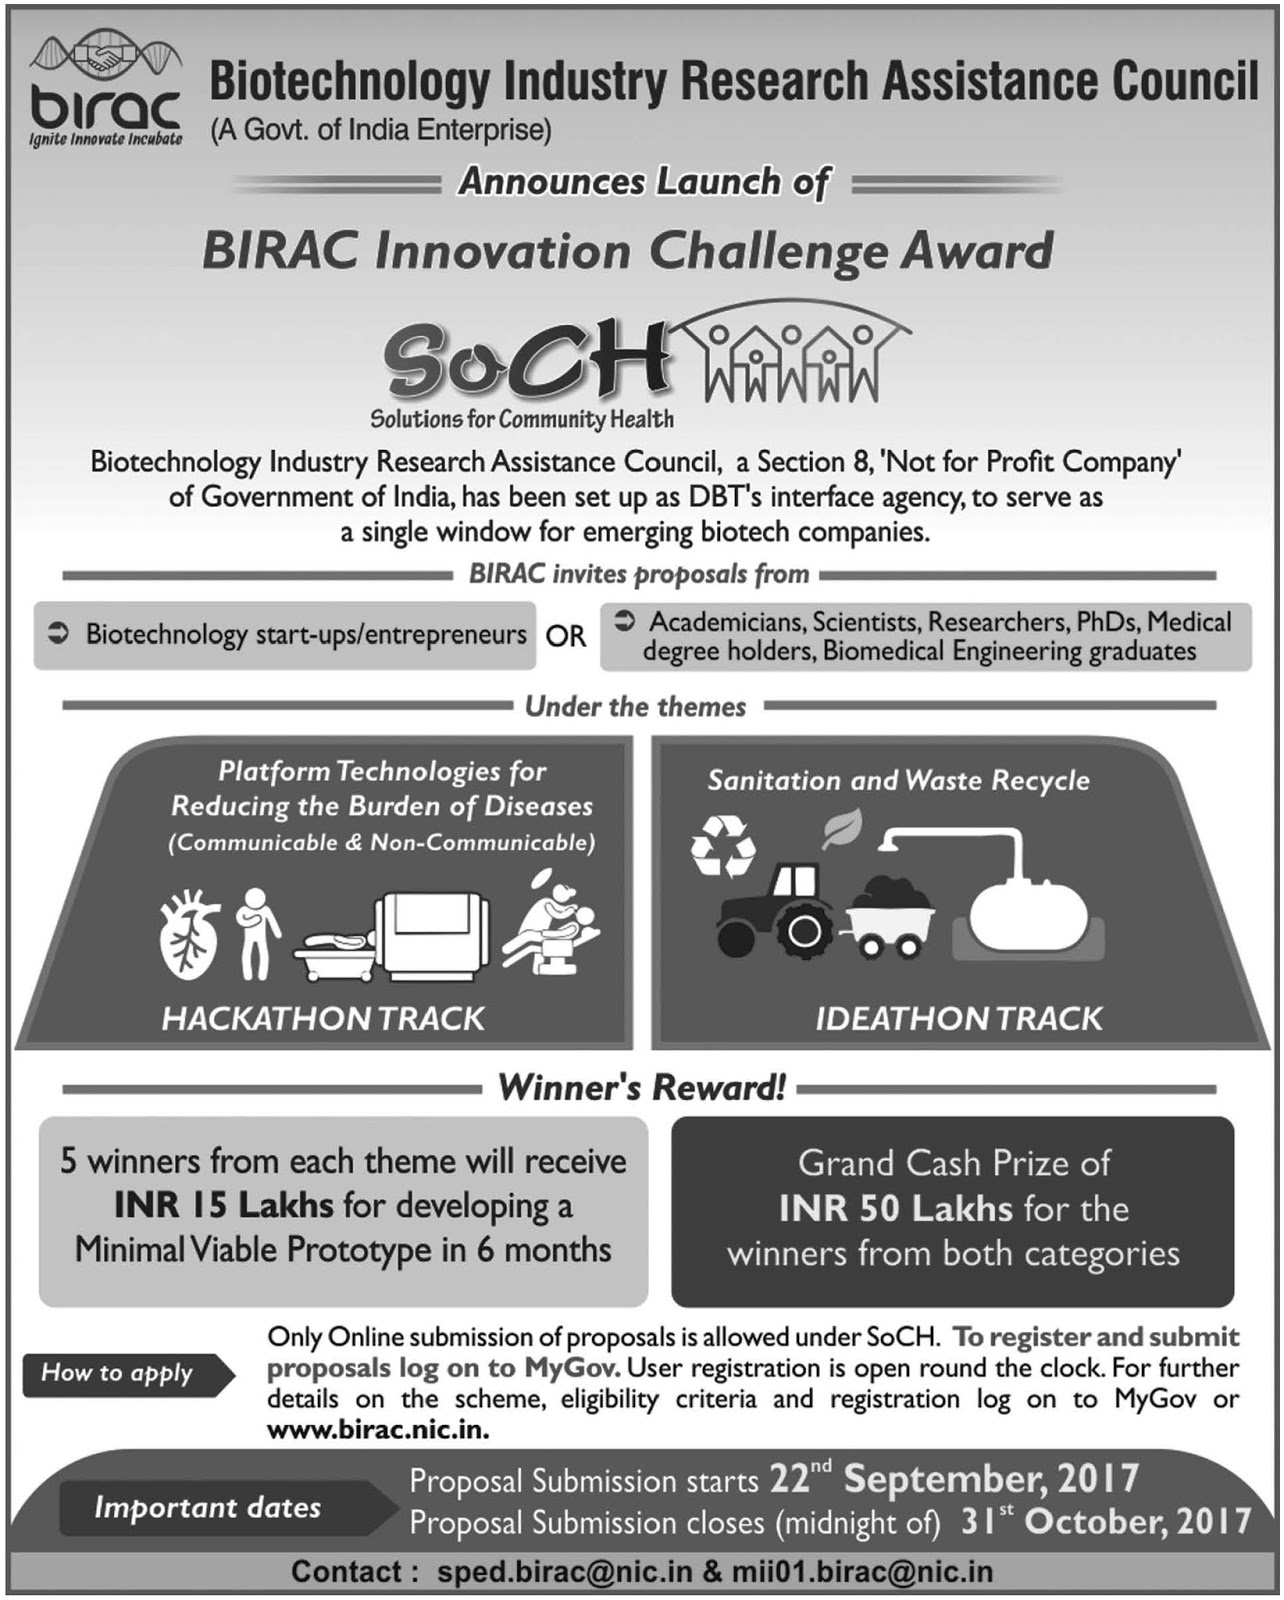 BIRAC Announces Innovation Challenge Awards 2017 ~ helpBIOTECH